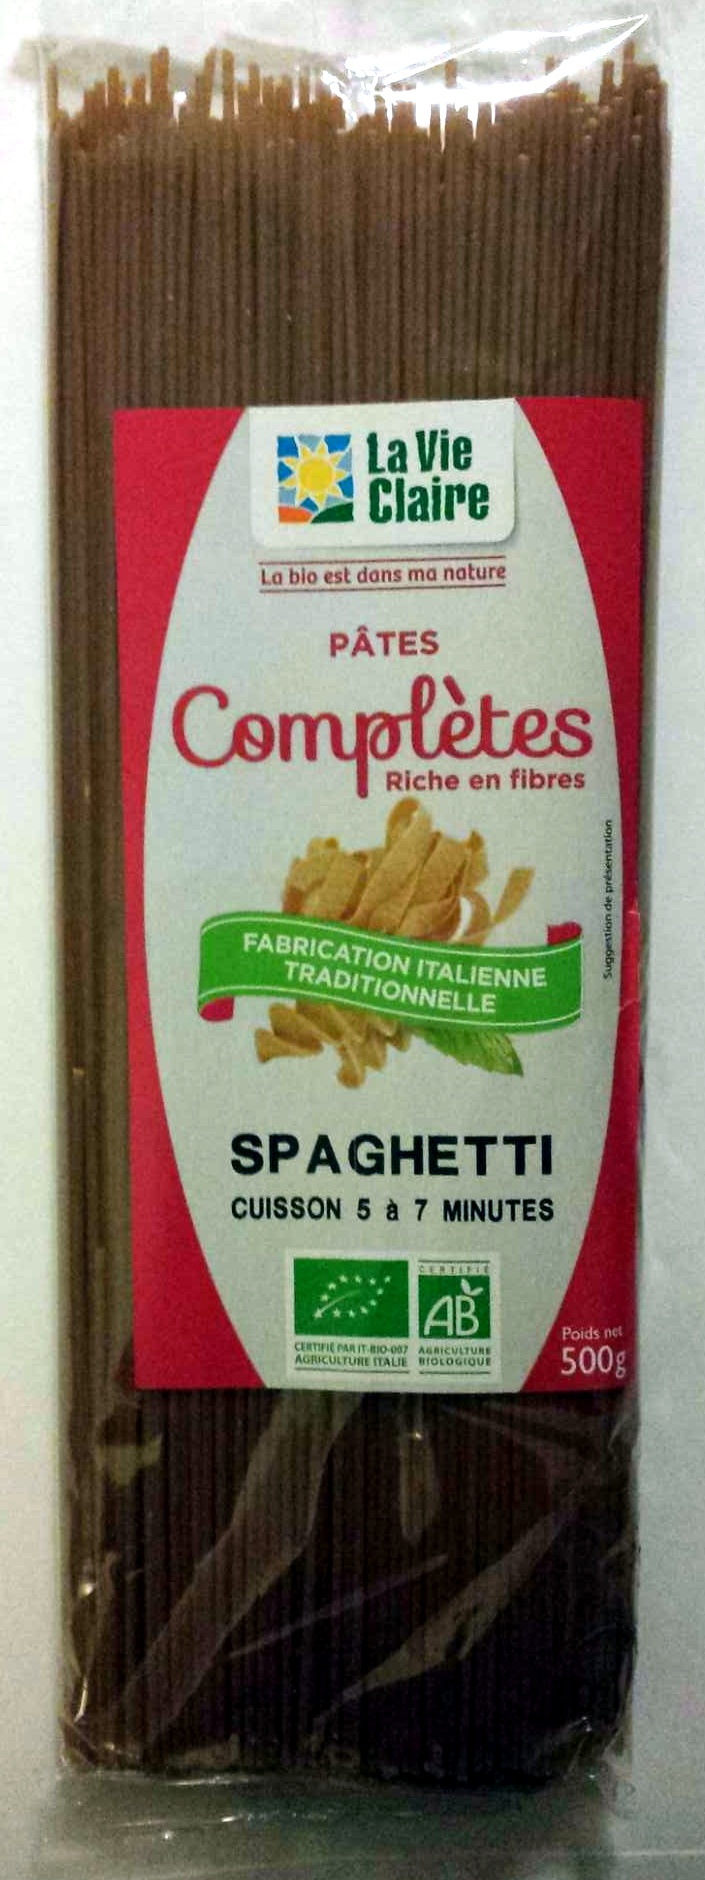 Pâtes complètes, Spaghetti Bio - Product - fr